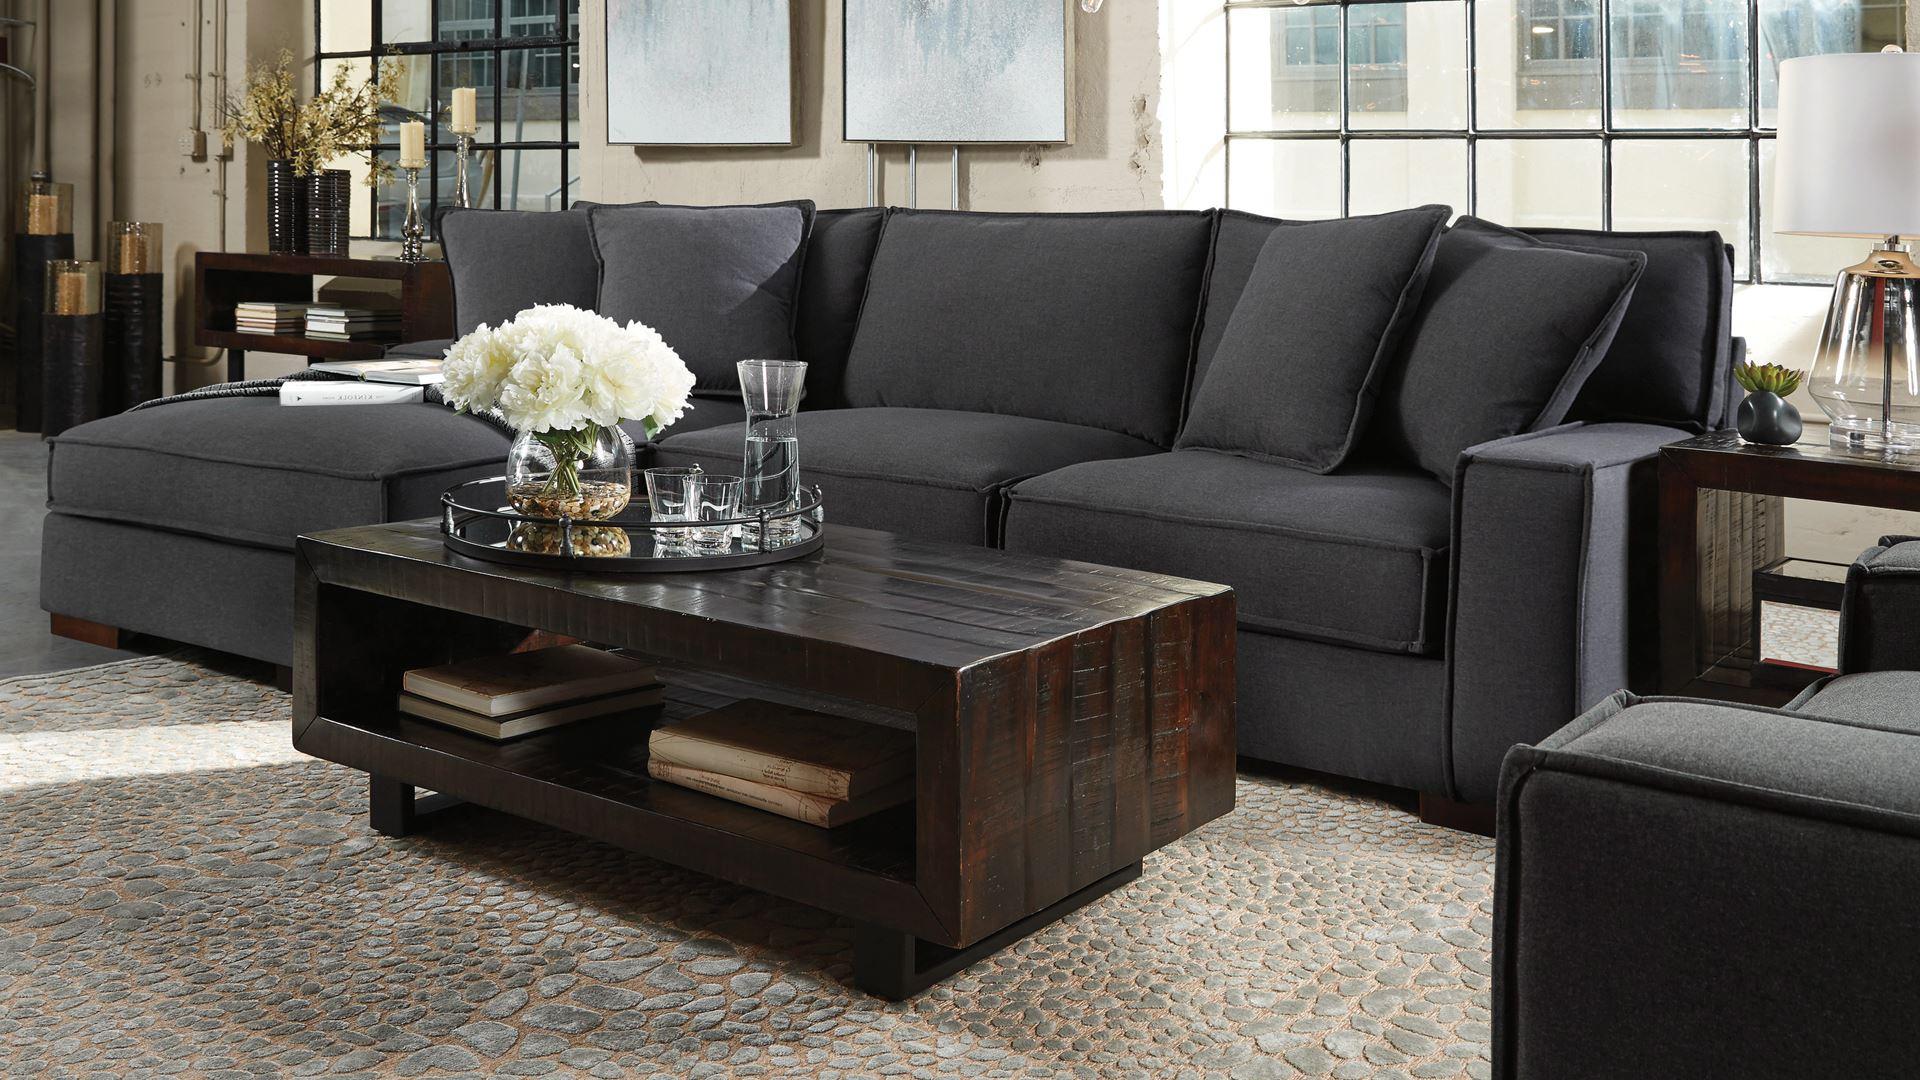 Ashley Furniture HomeStore 4281 Roswell Rd Suite 312, Marietta